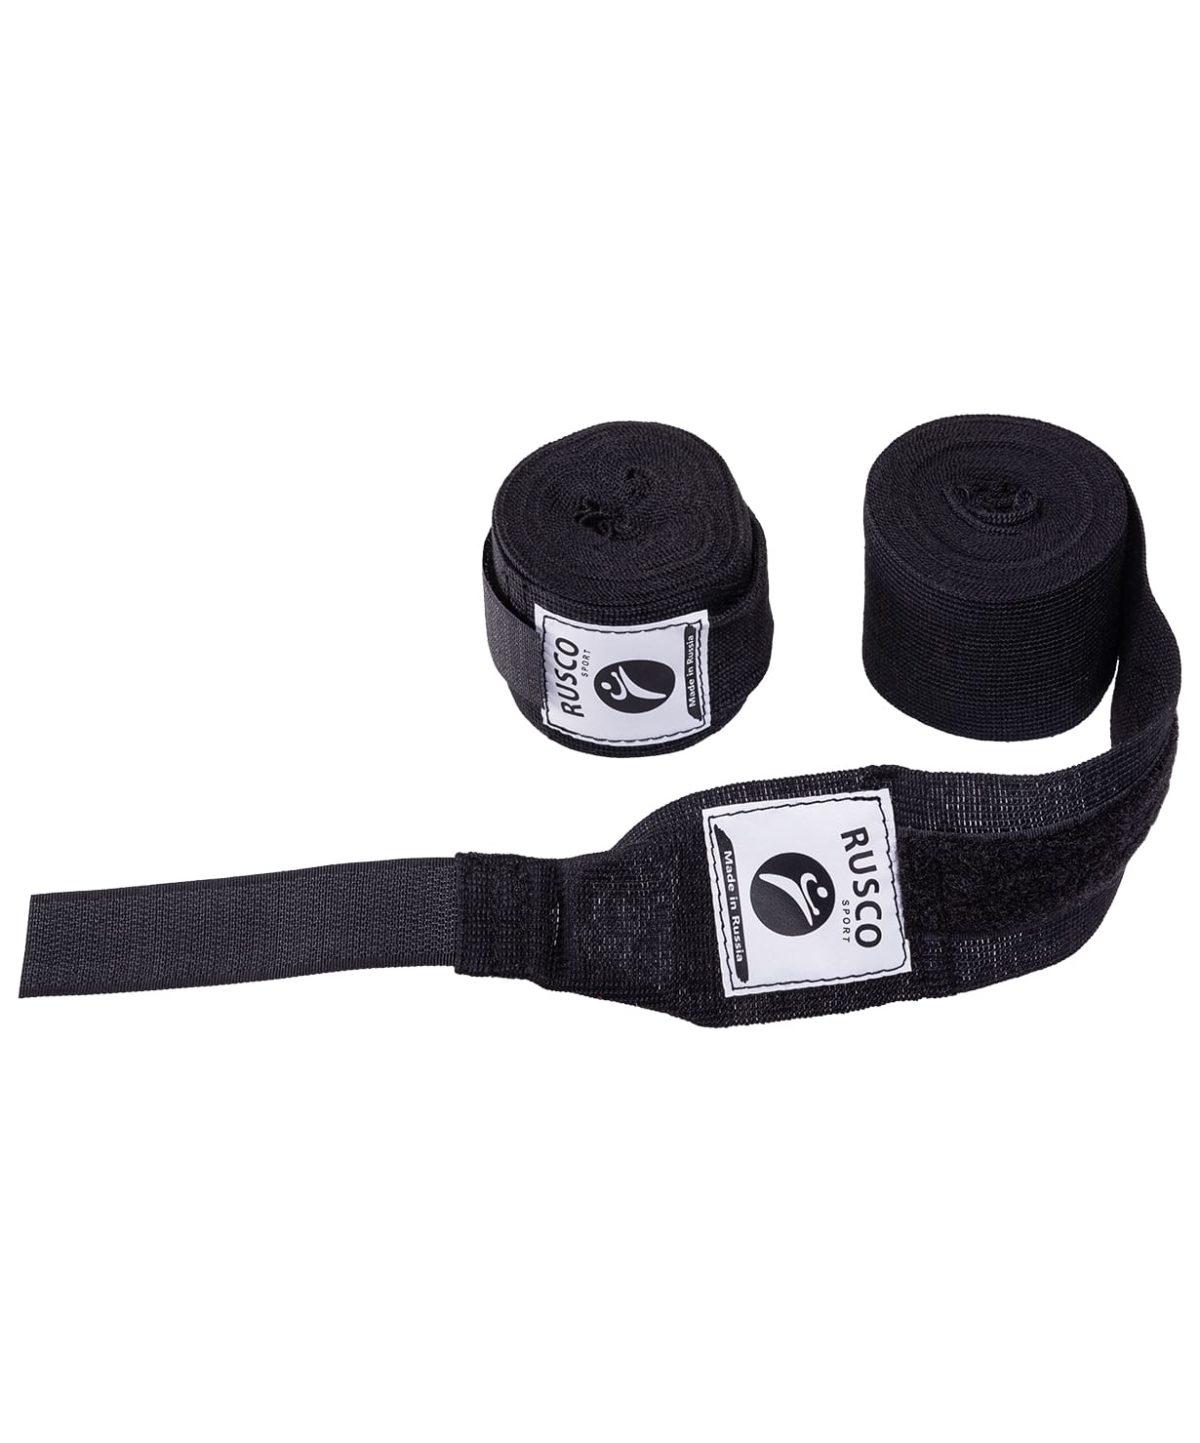 RUSCO Бинт боксерский, 3,5м, хлопок  126: чёрный - 1